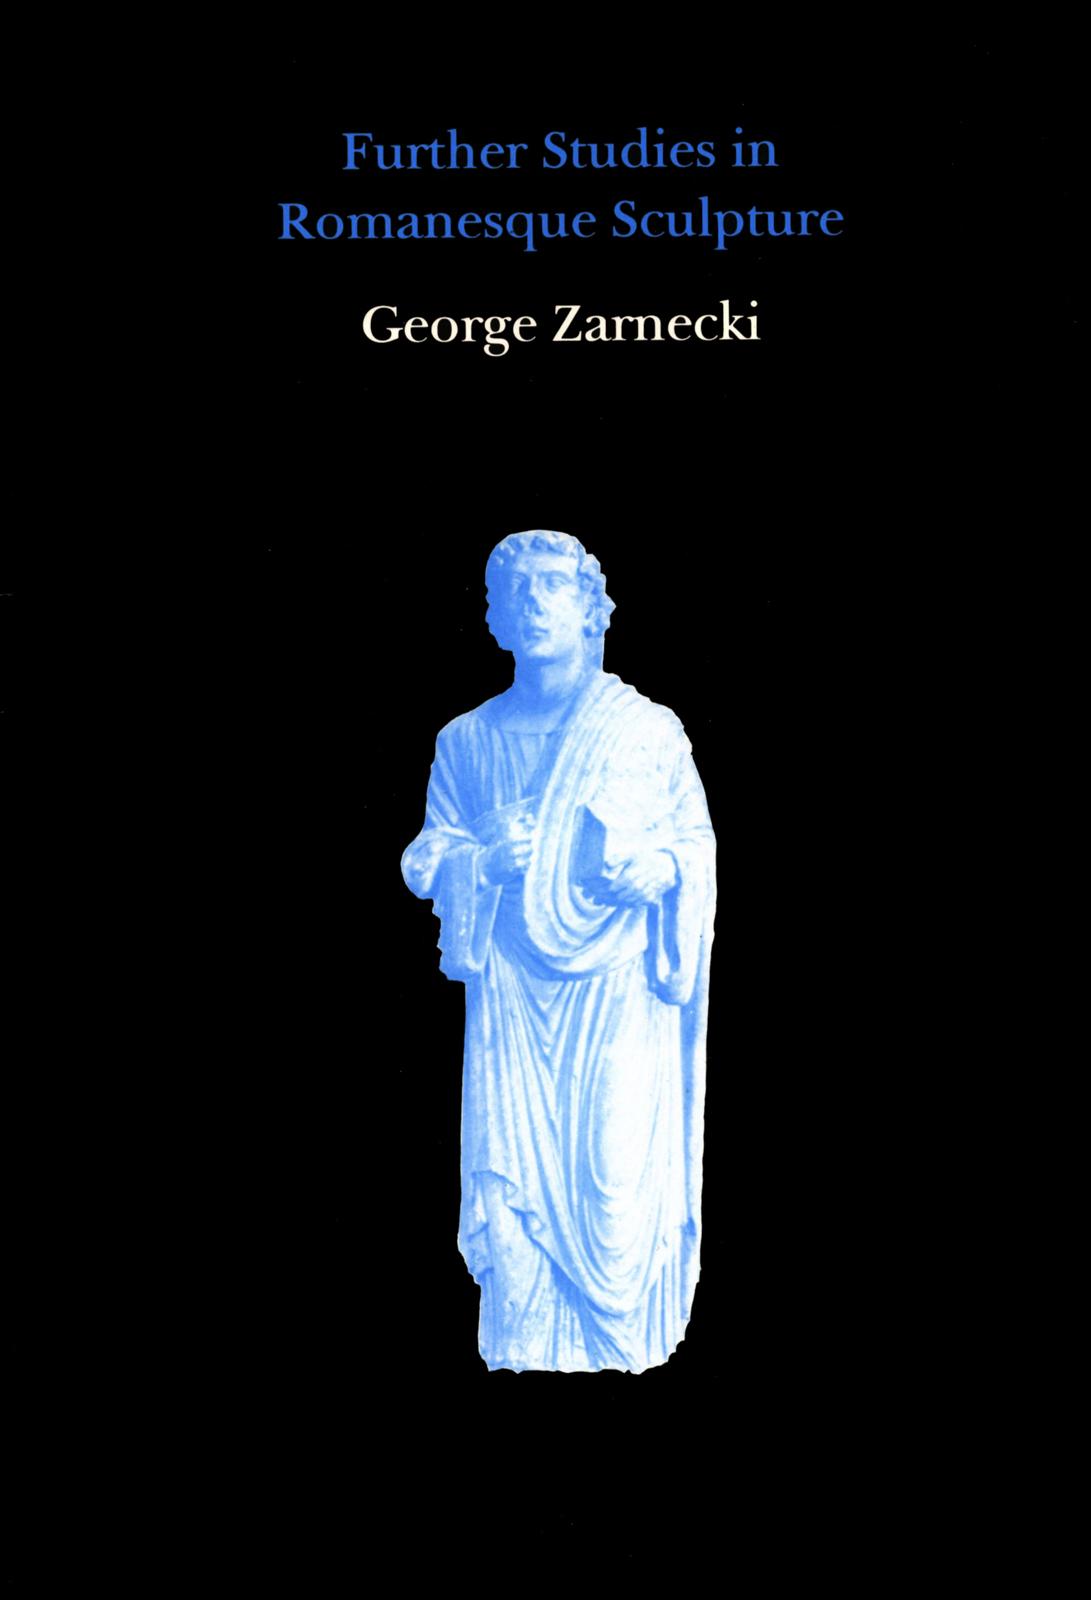 George Zarnecki